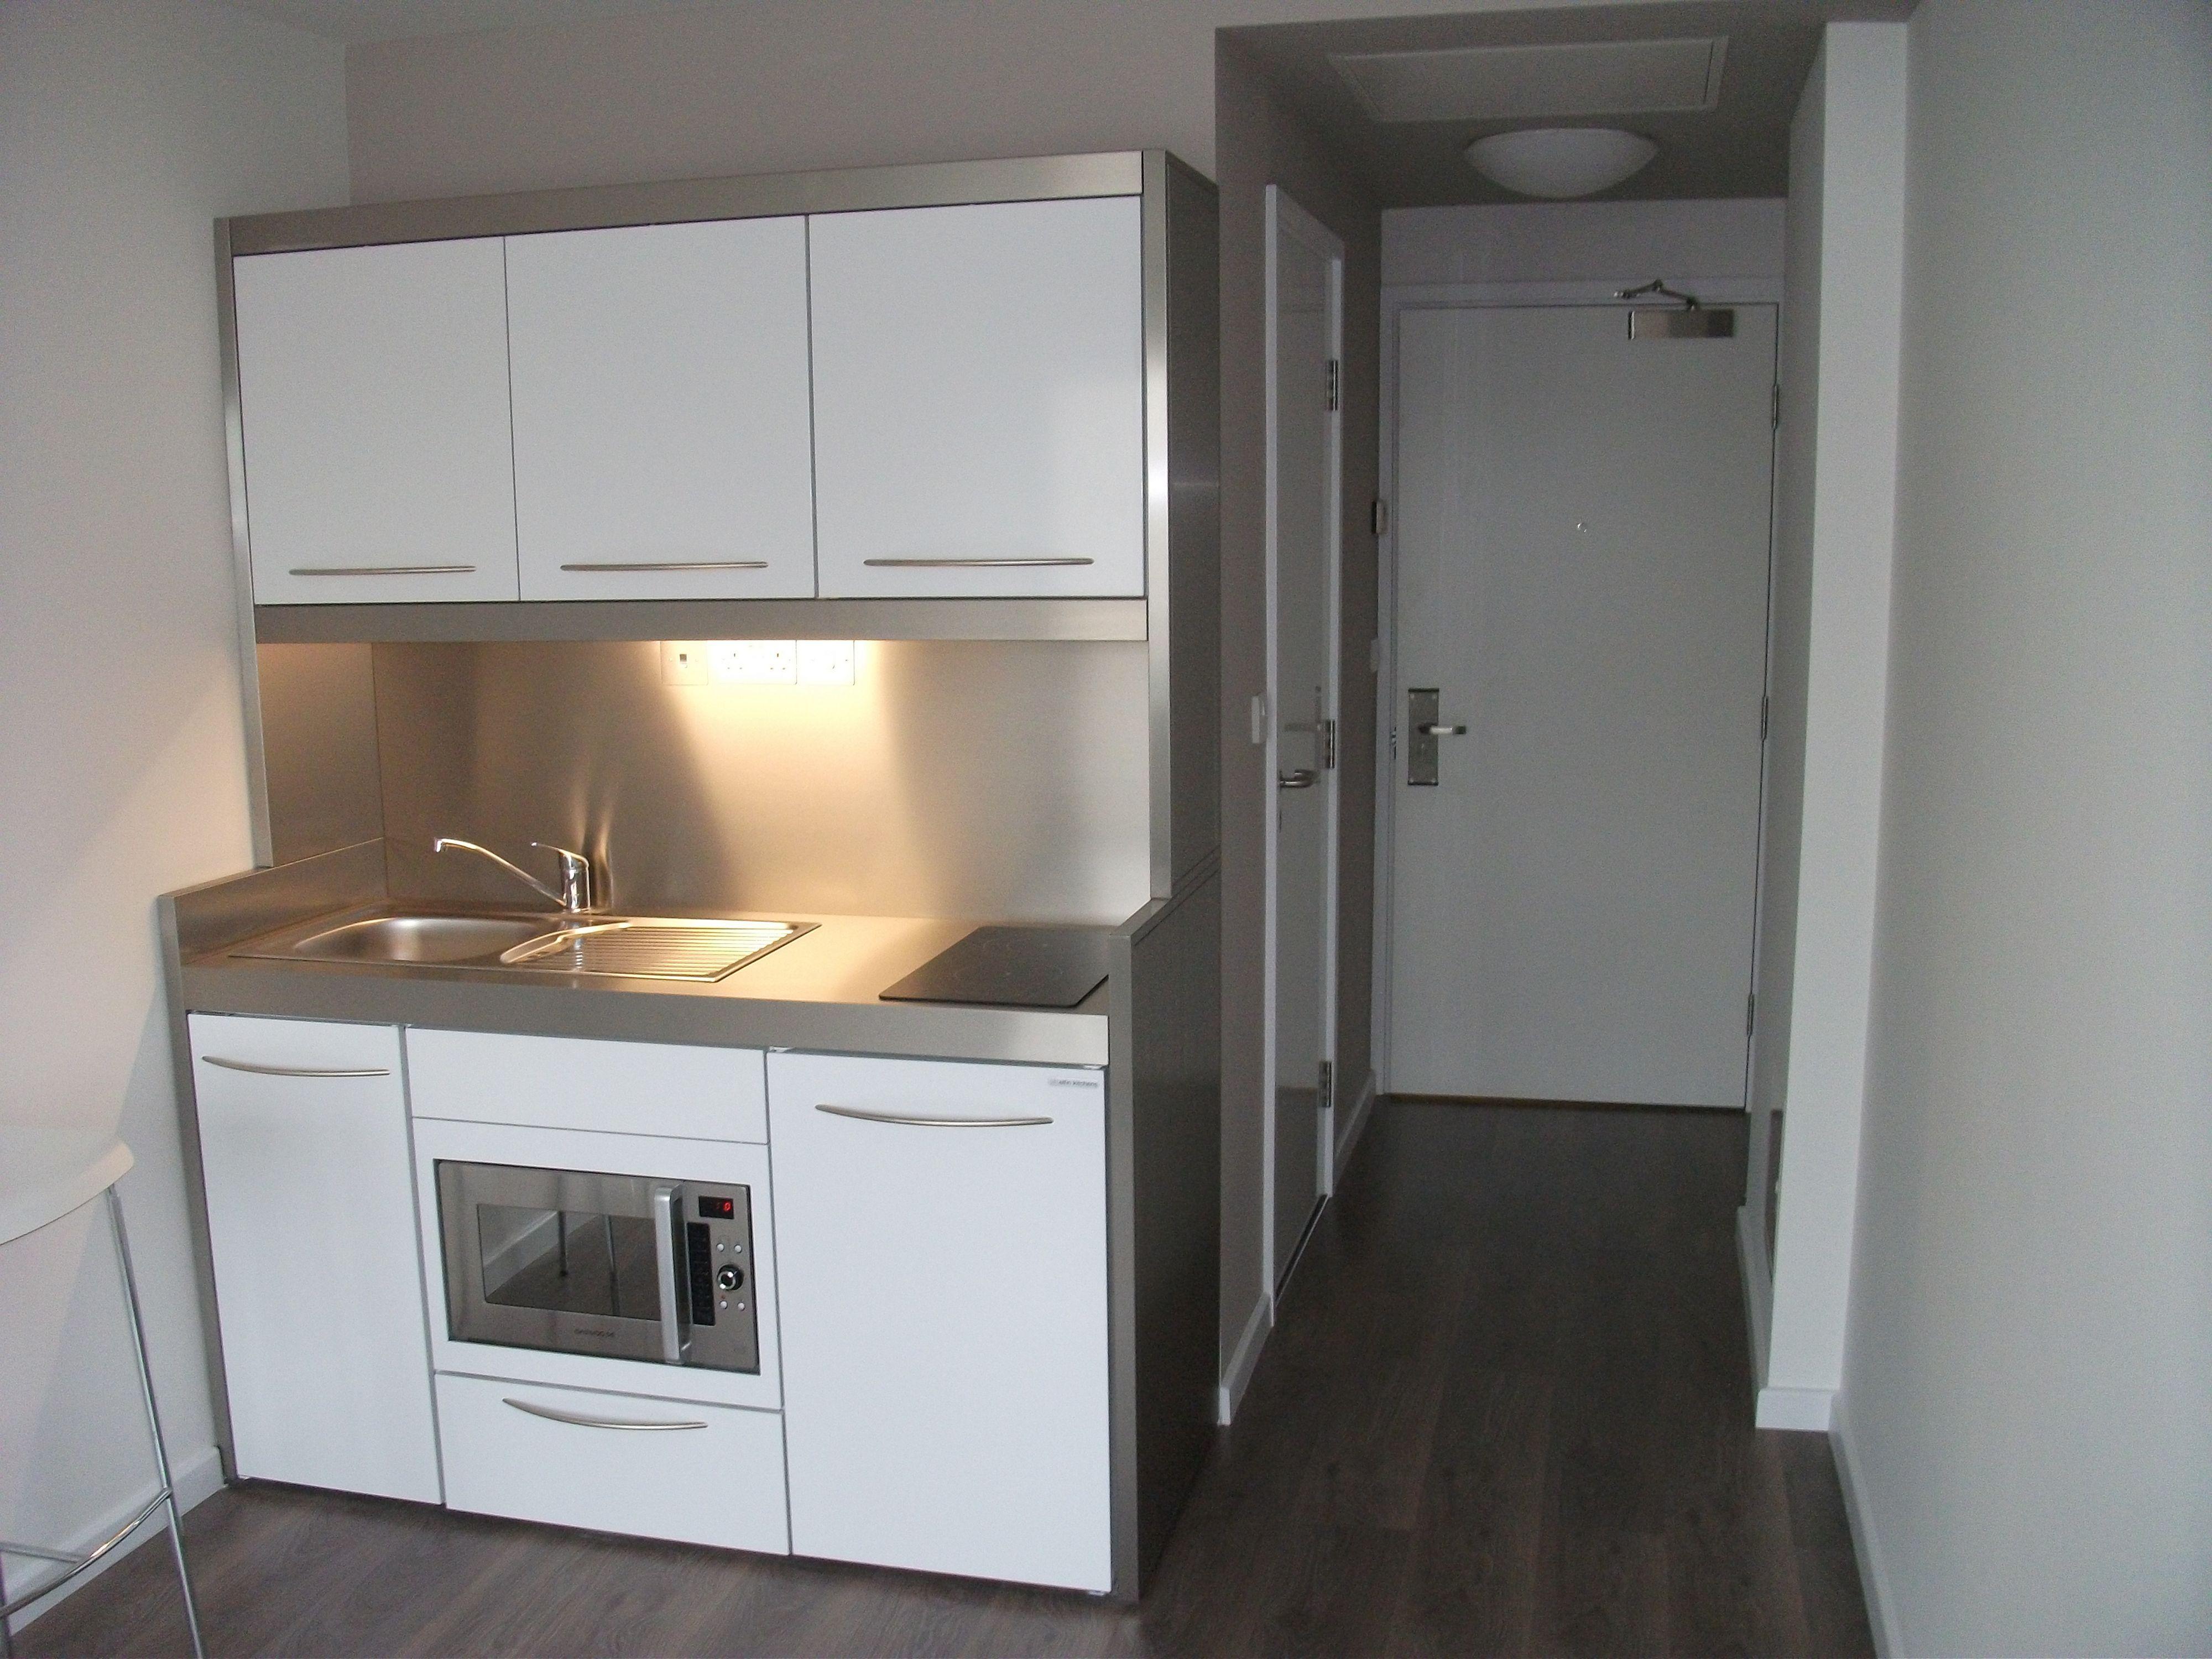 Best 45 Best Charming Mini Kitchen Design Ideas For Inspiration Https Usdecorating Com 2245 45 Best Charming For I Studio Kitchen Mini Kitchen Kitchen Design